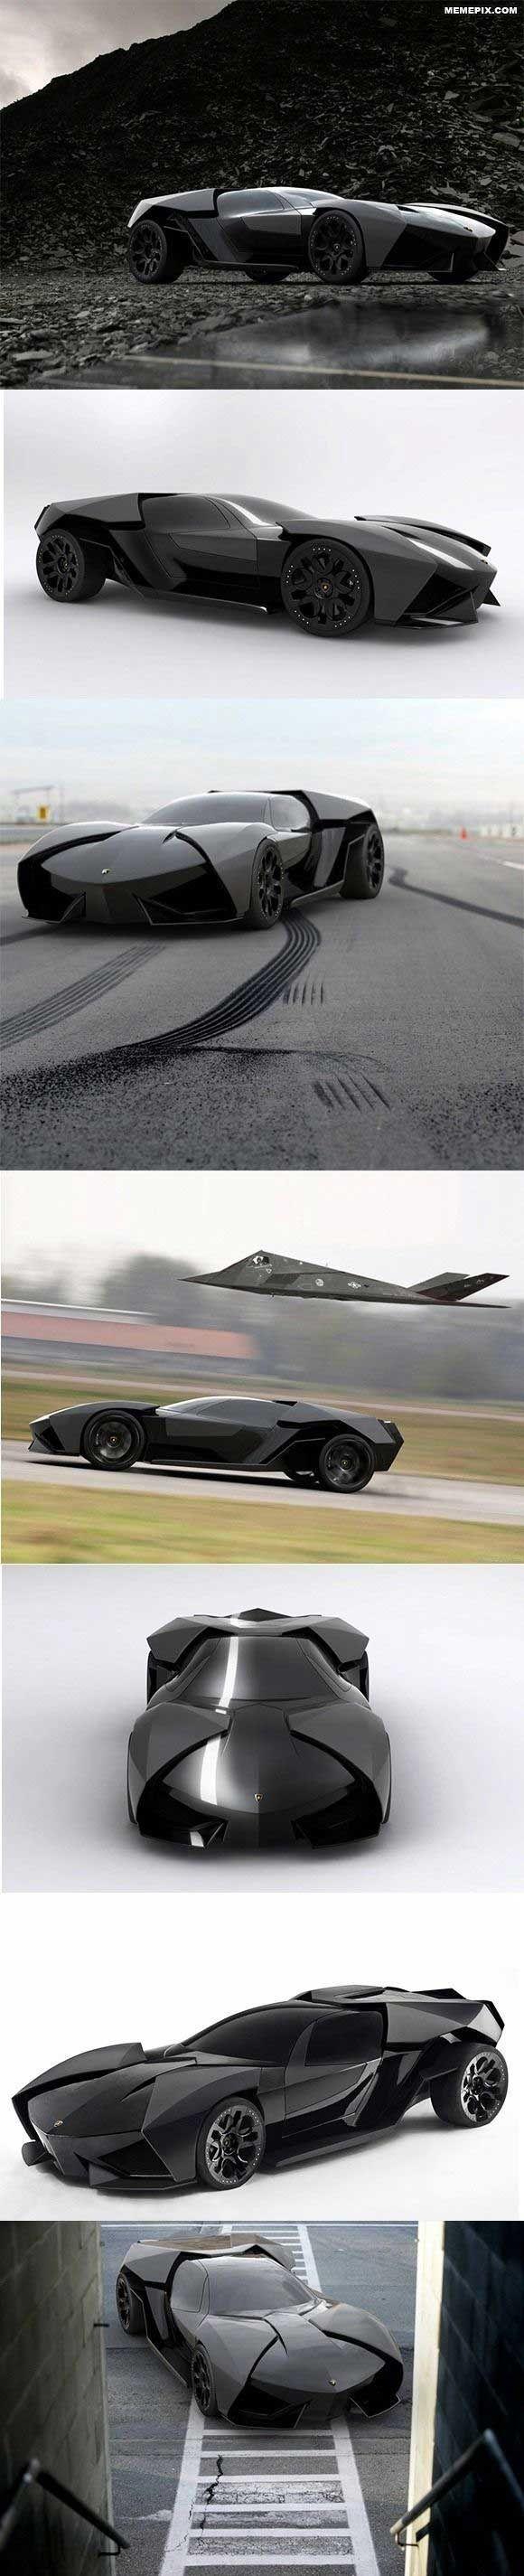 Lamborghini Ankonian a.k.a BatMobile: